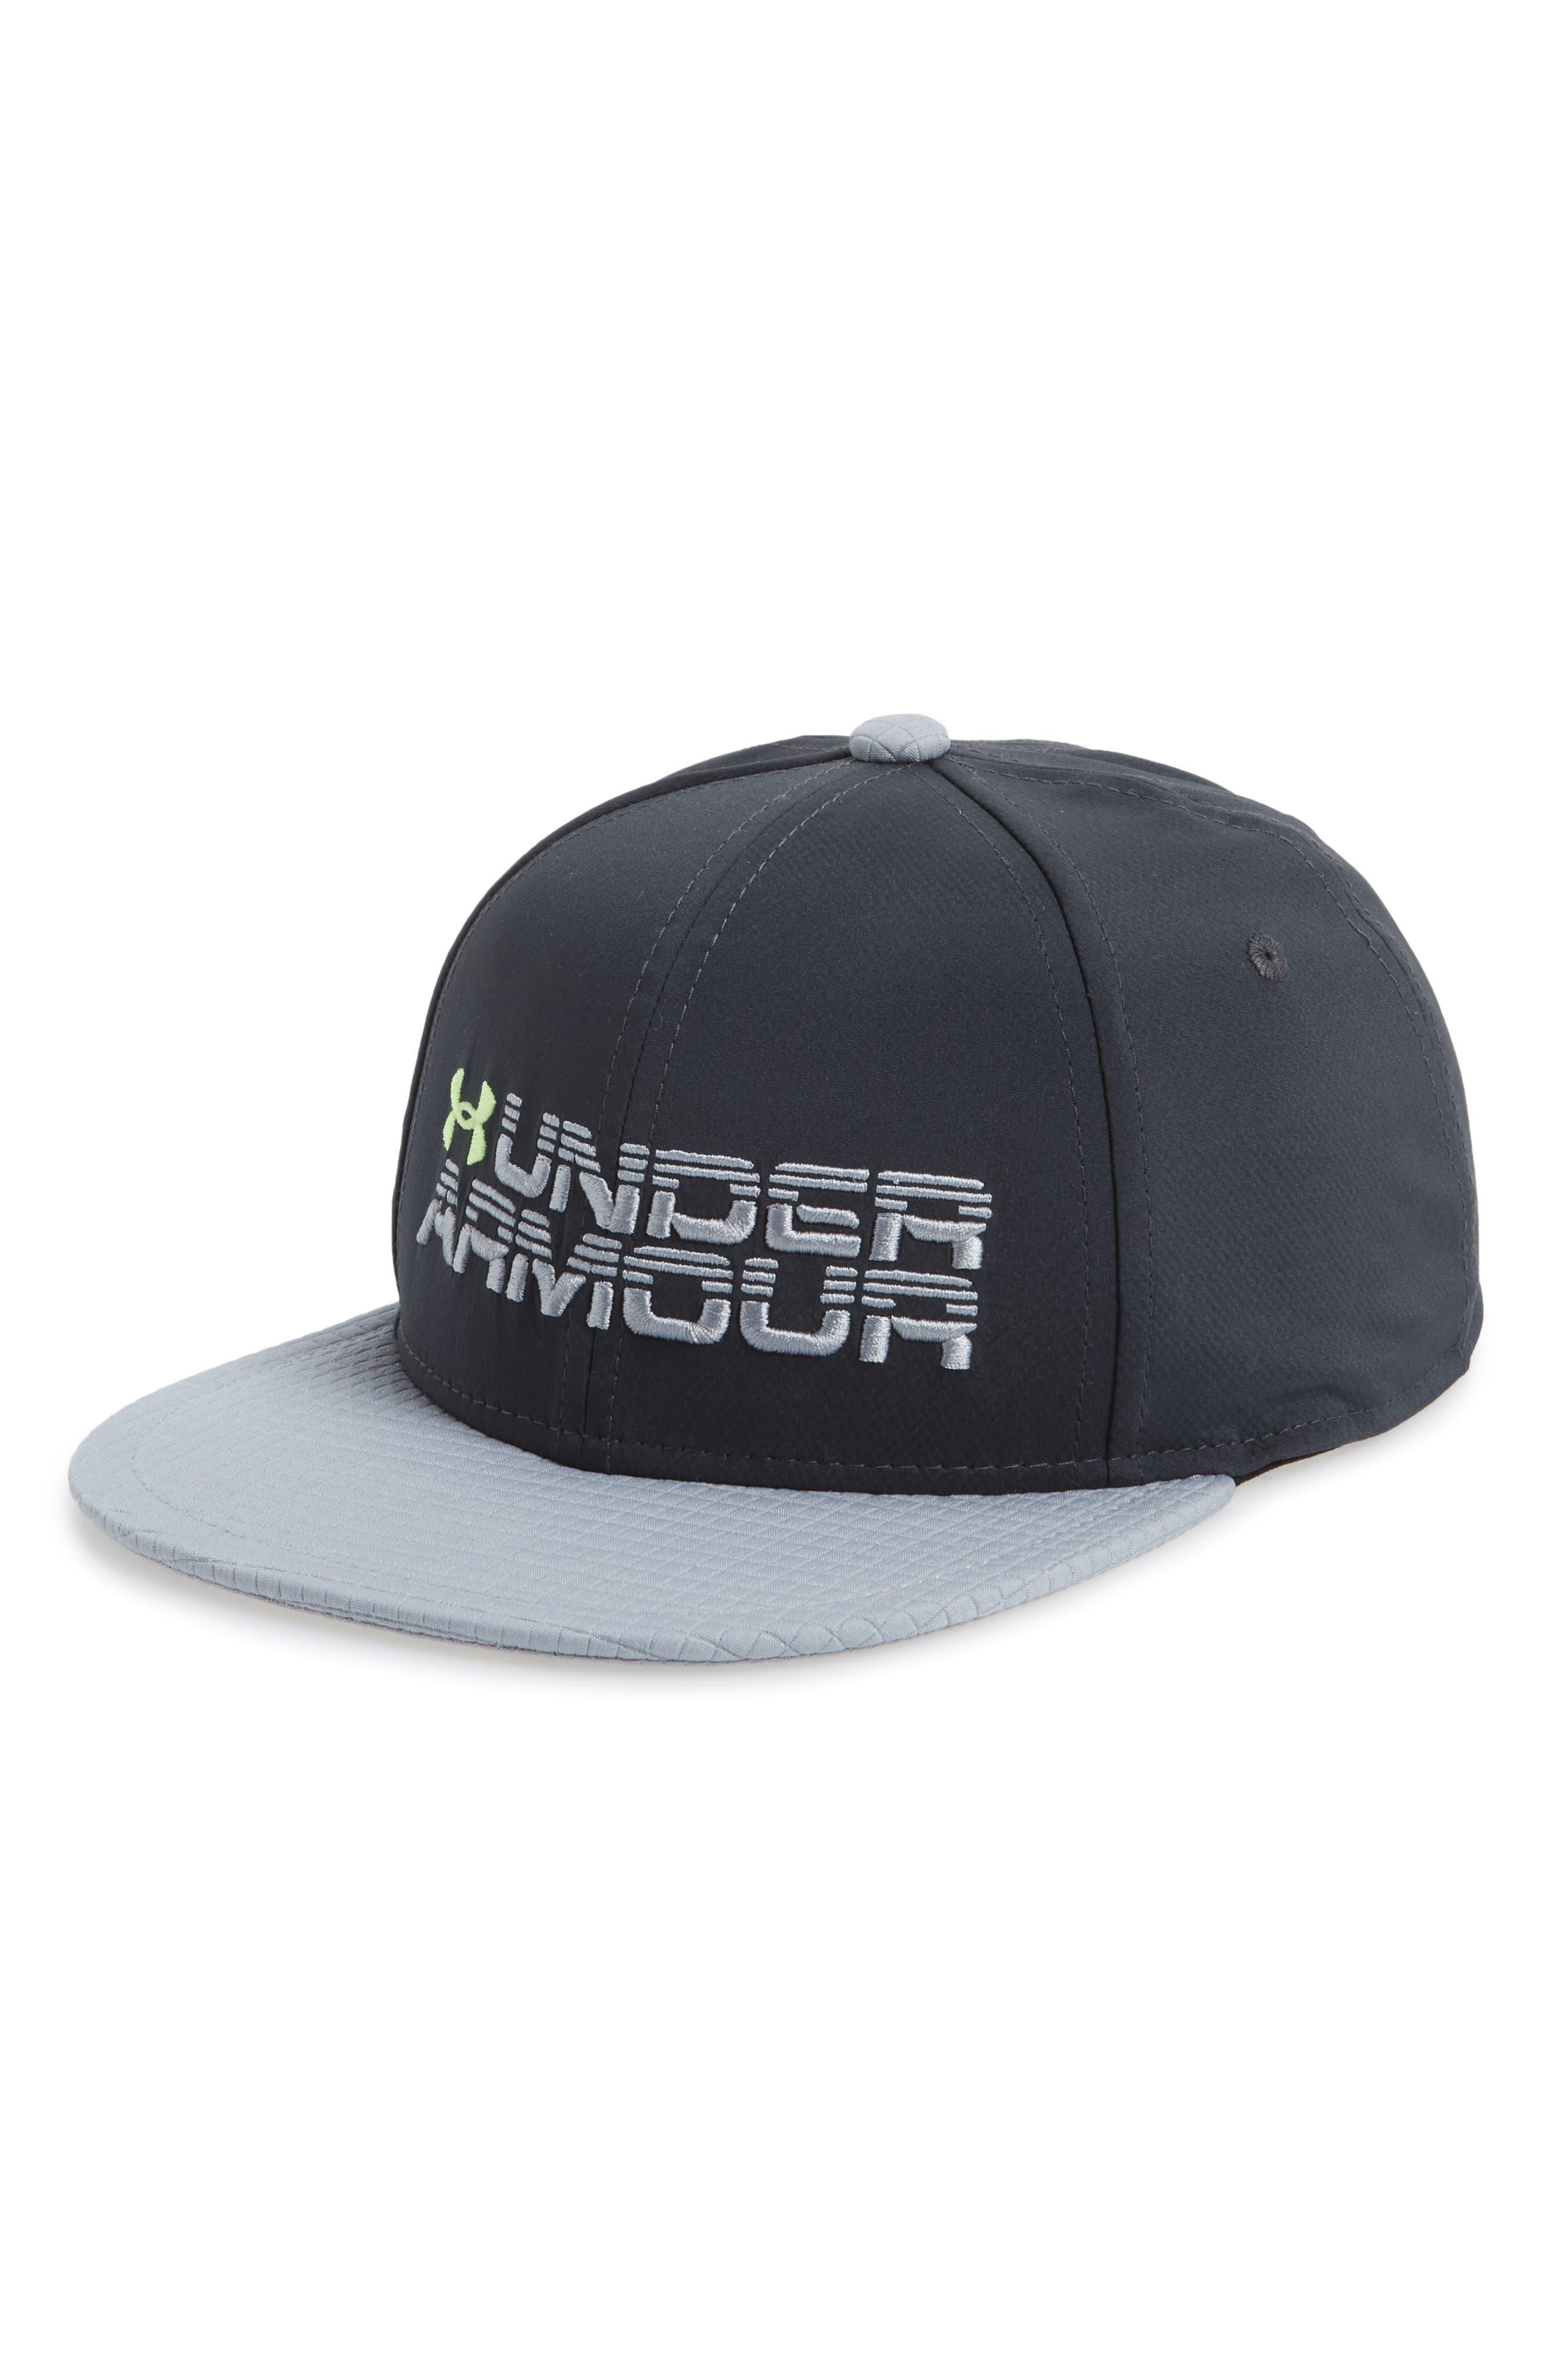 UNDER ARMOUR Logo Snapback Hat